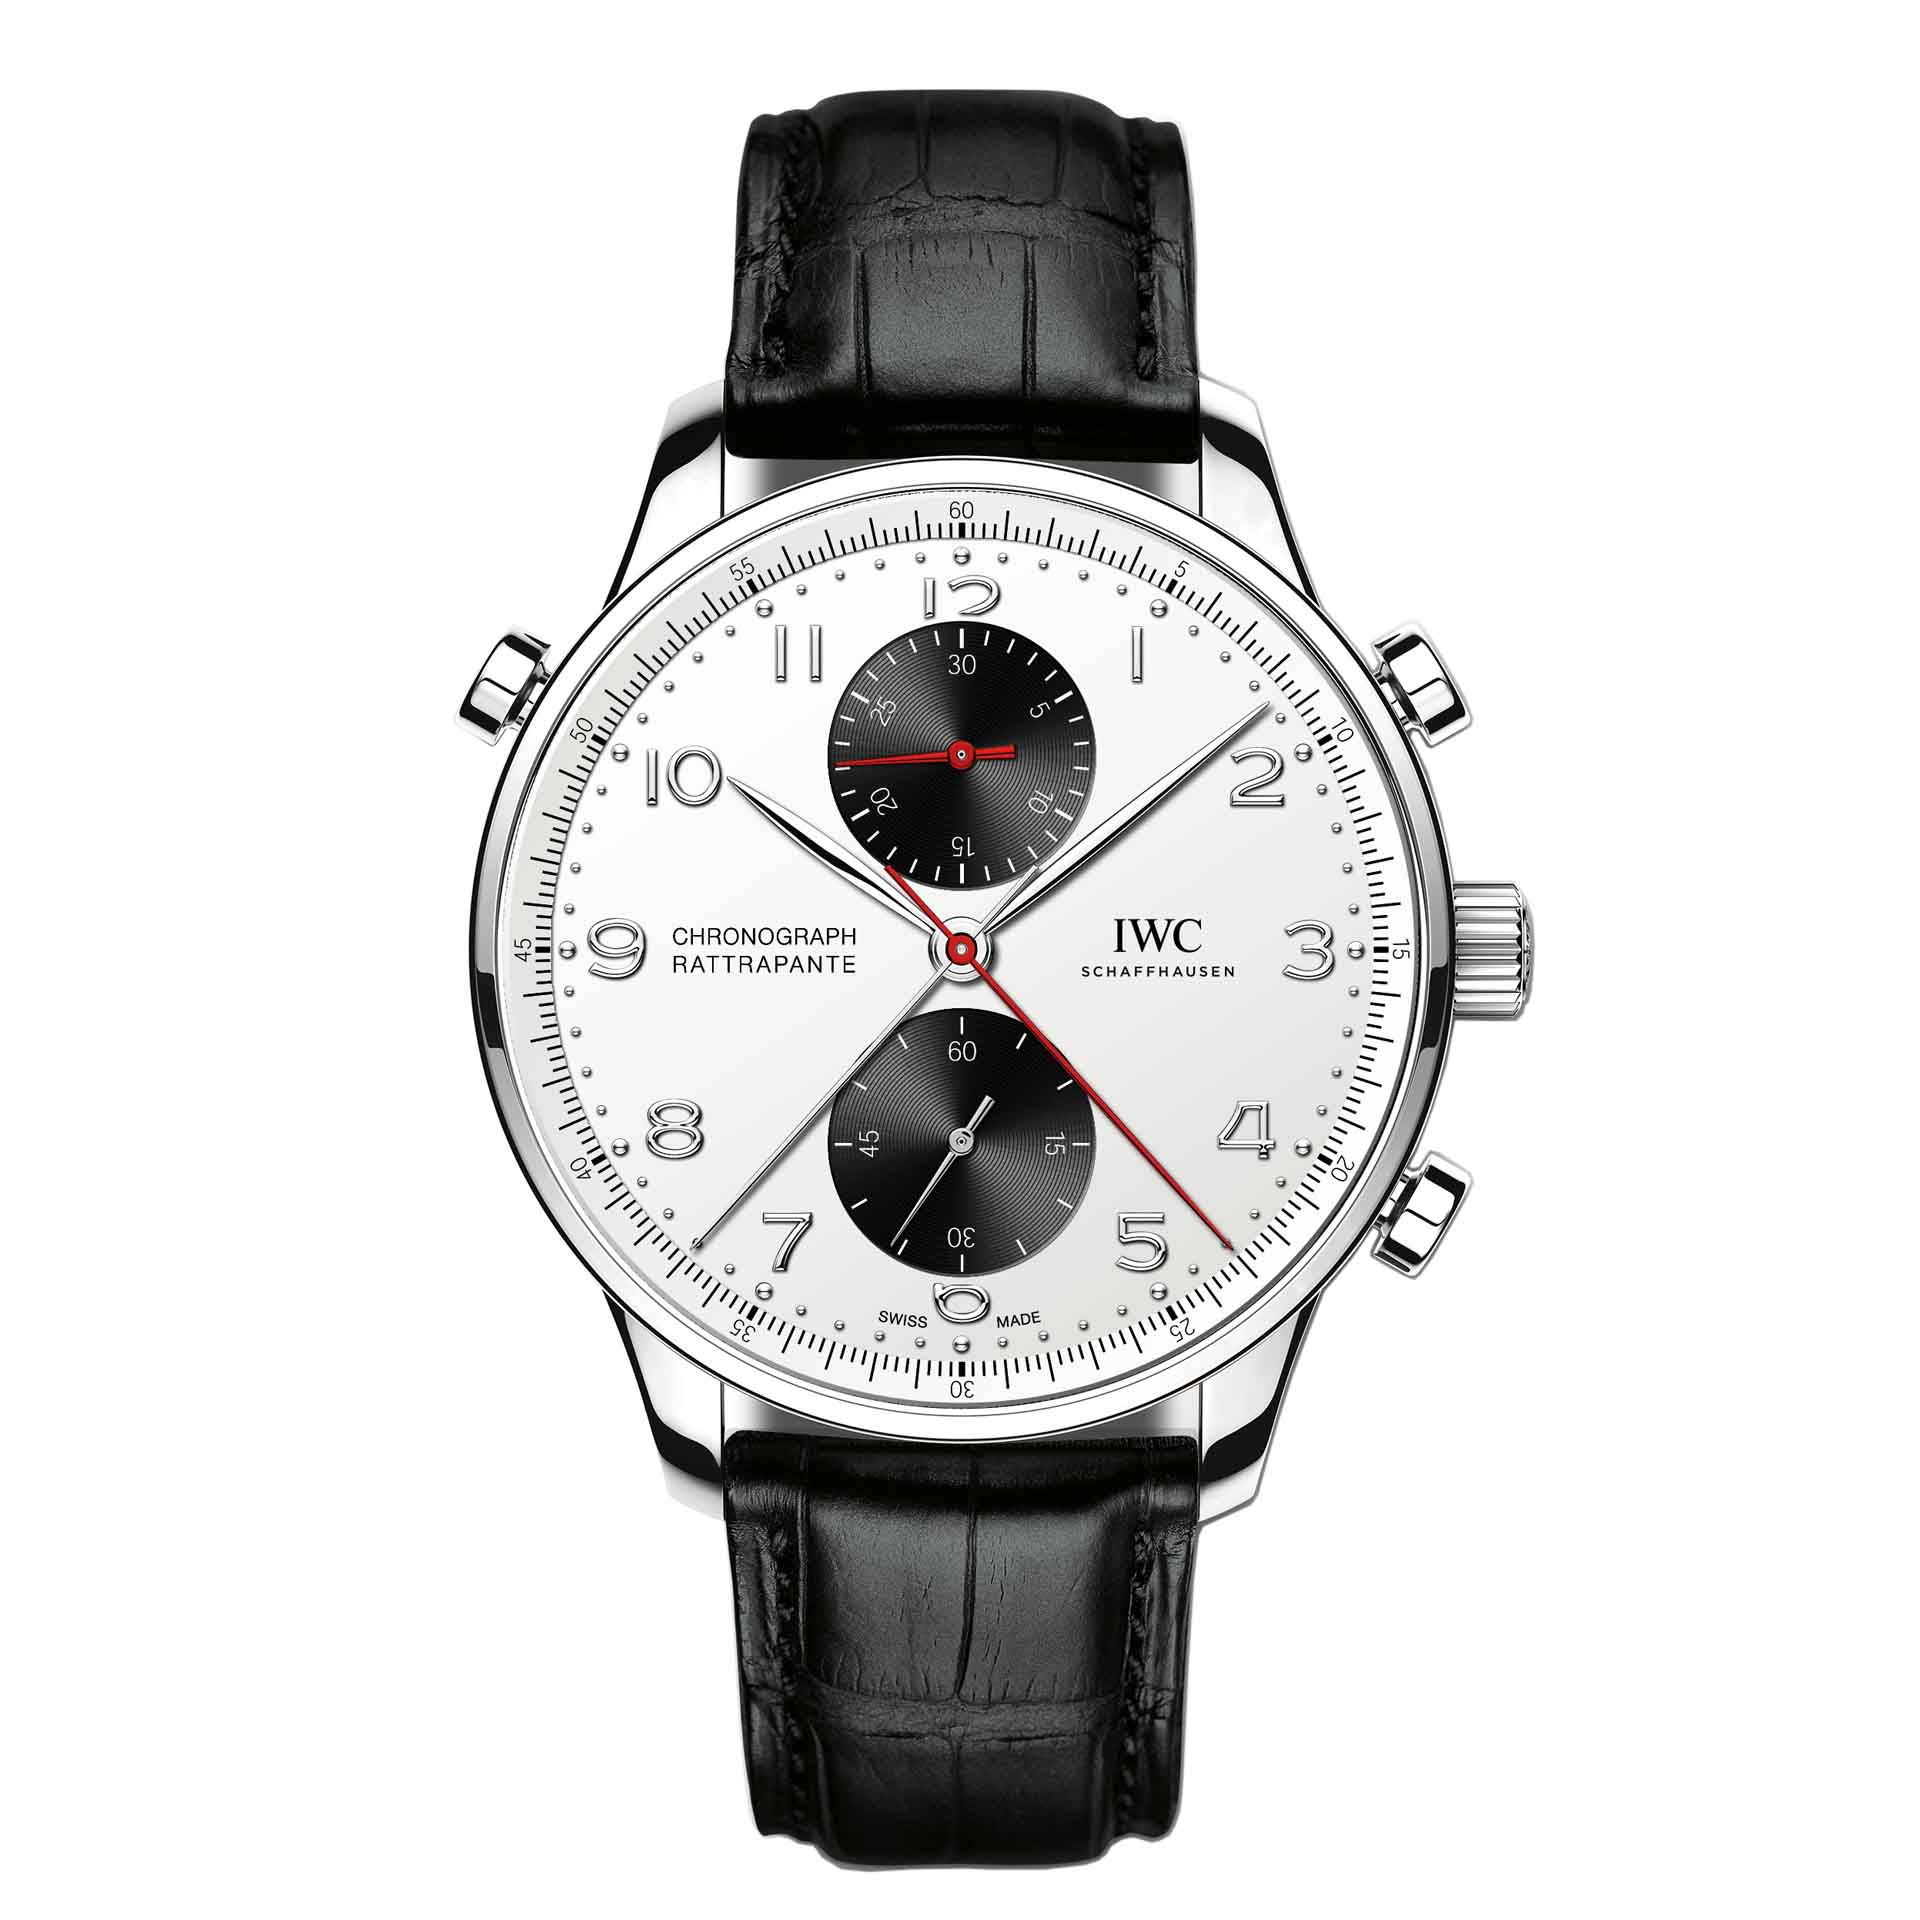 Iwc Portugieser Chronograph Rattrapante Edition Boutique